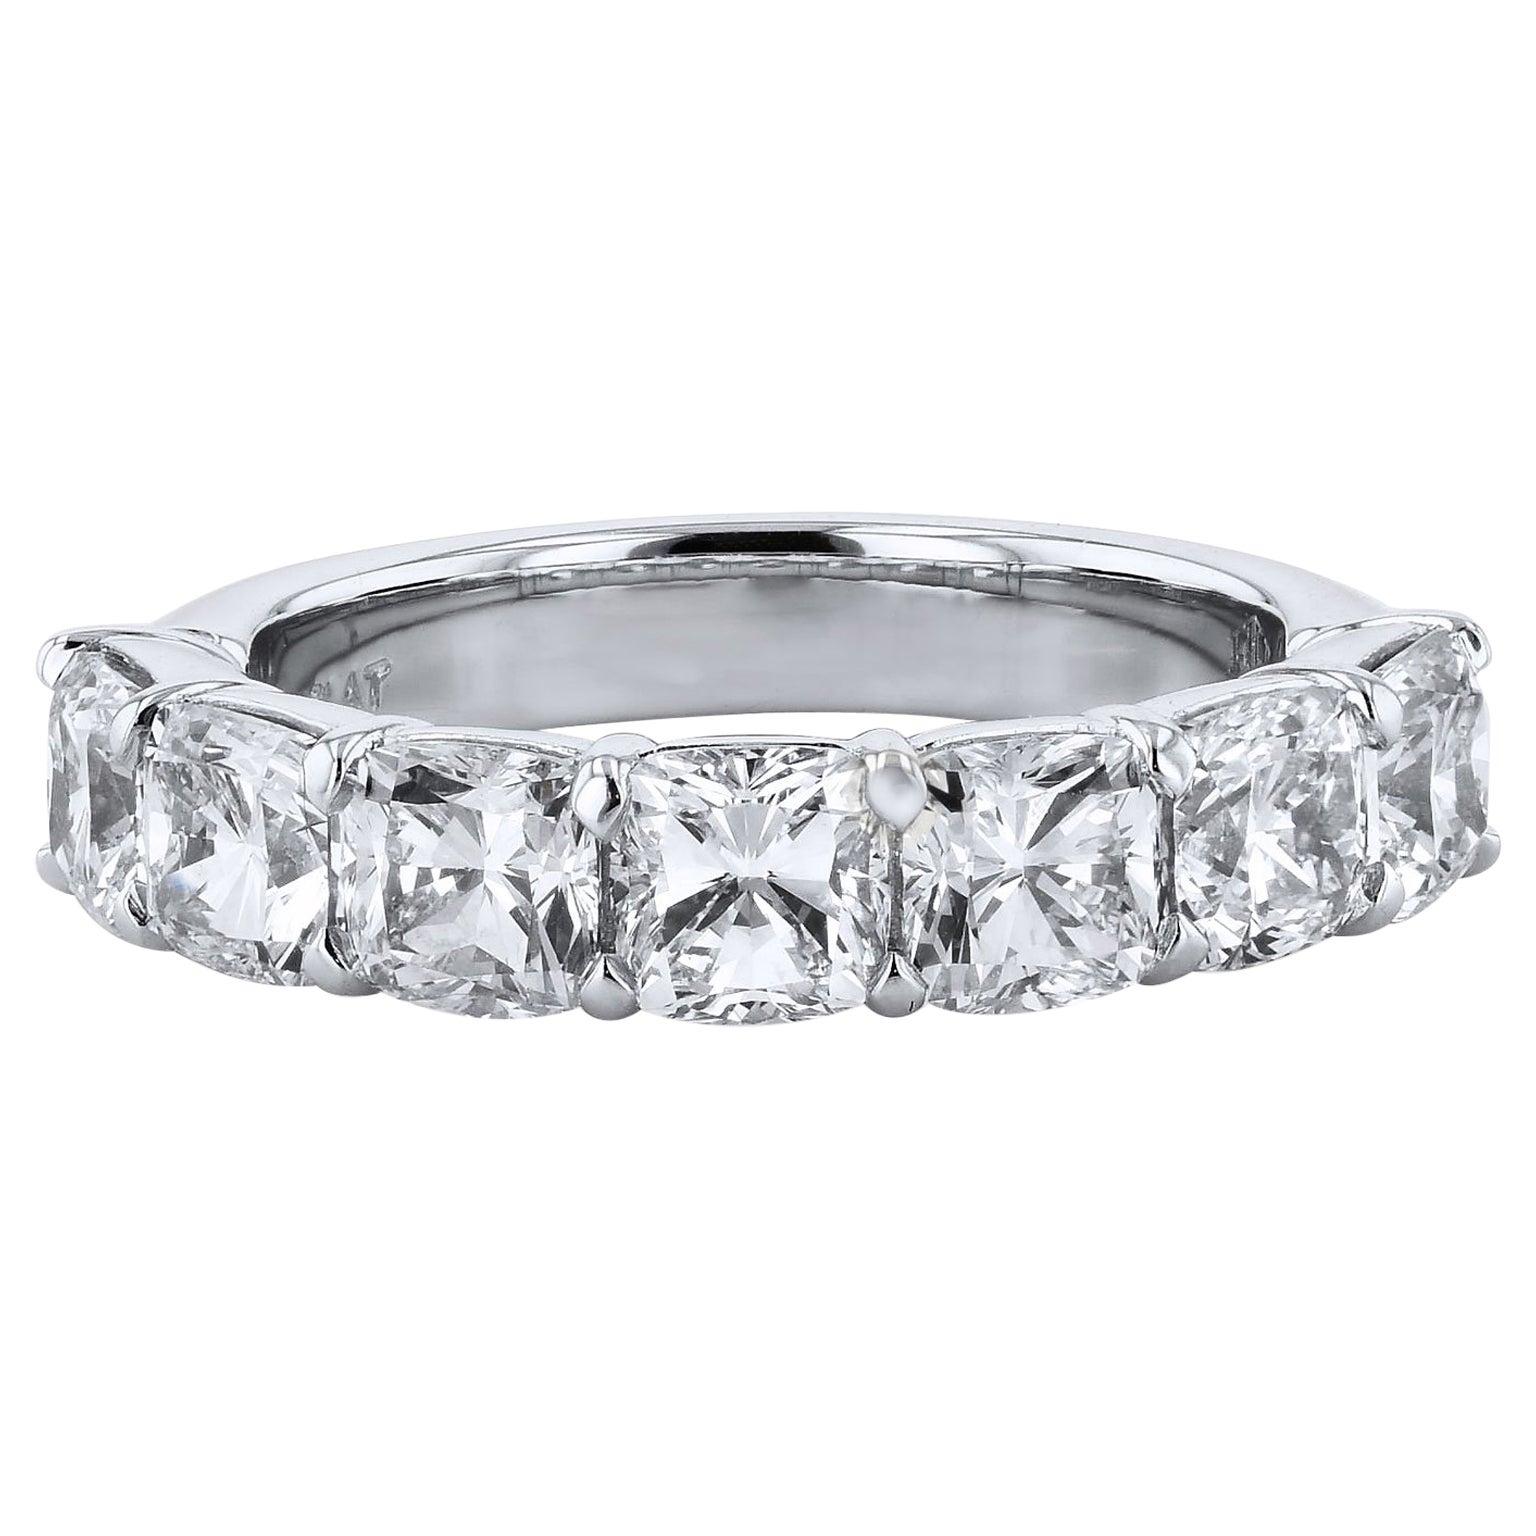 3.50 Carat Seven Stone Cushion Cut Diamond Platinum Eternity Band